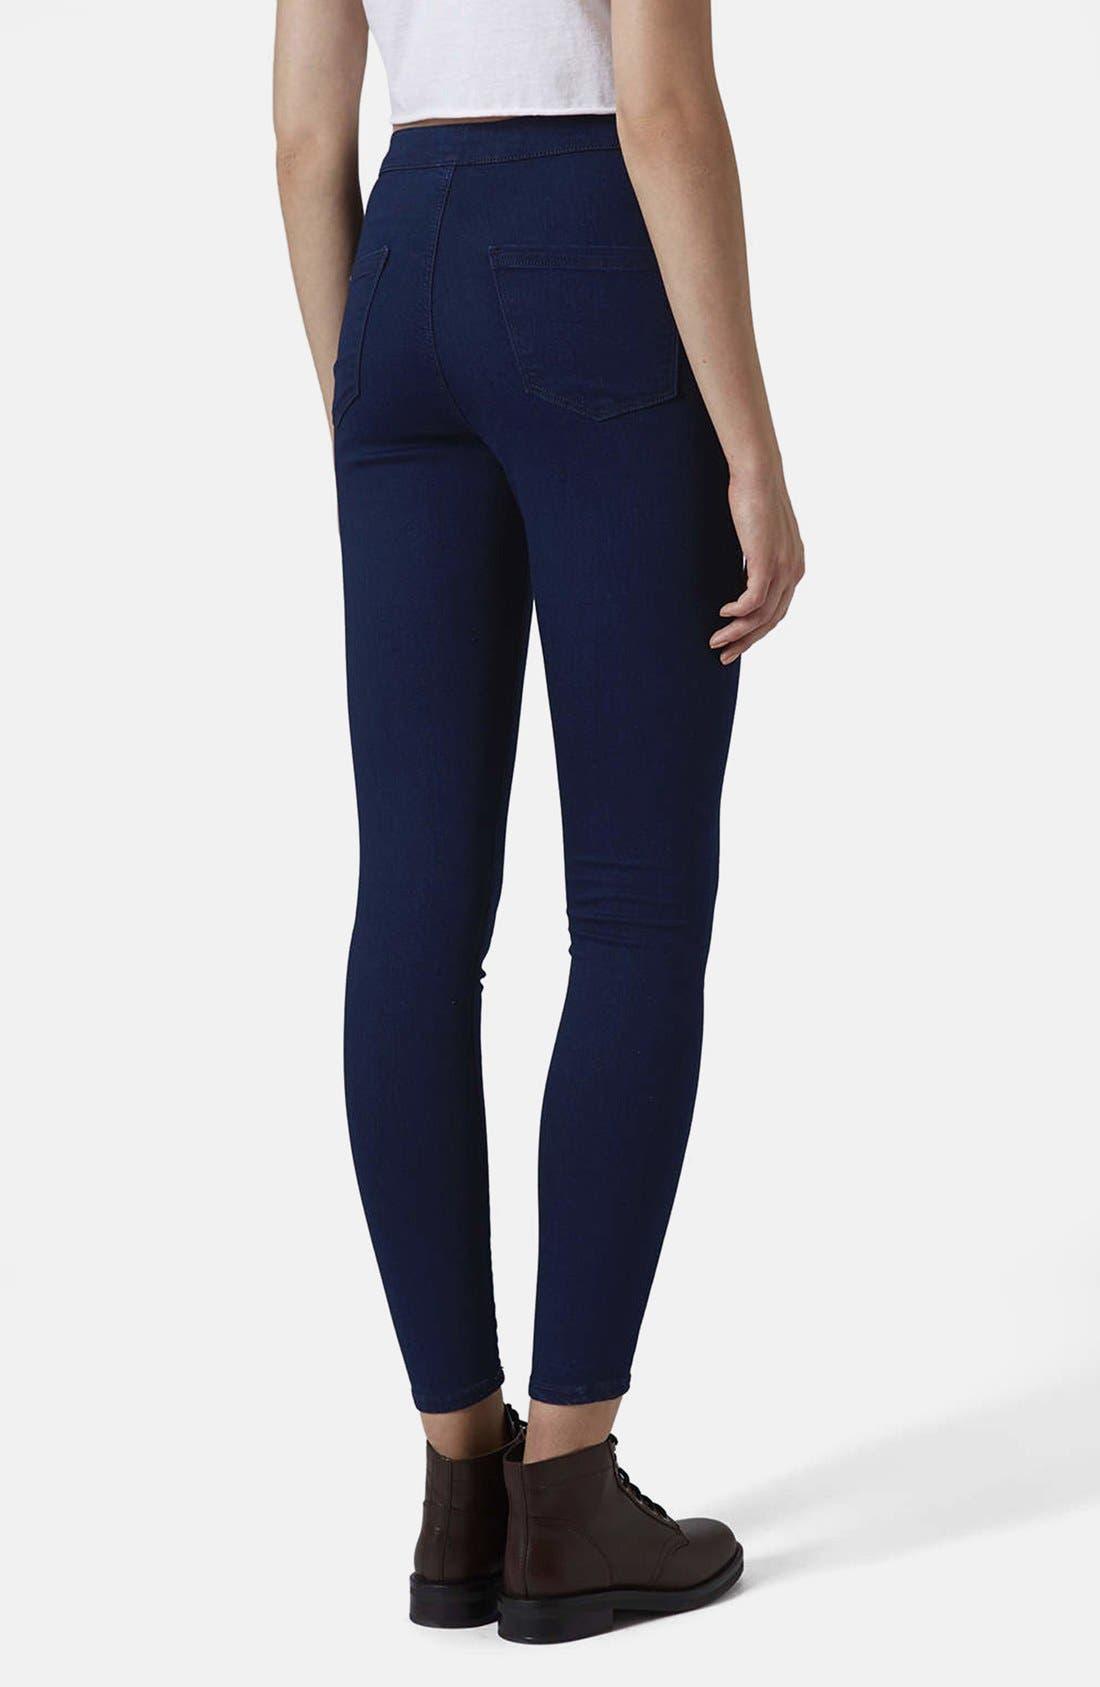 Alternate Image 2  - Topshop Moto 'Joni' High Waist Skinny Jeans (Blue)